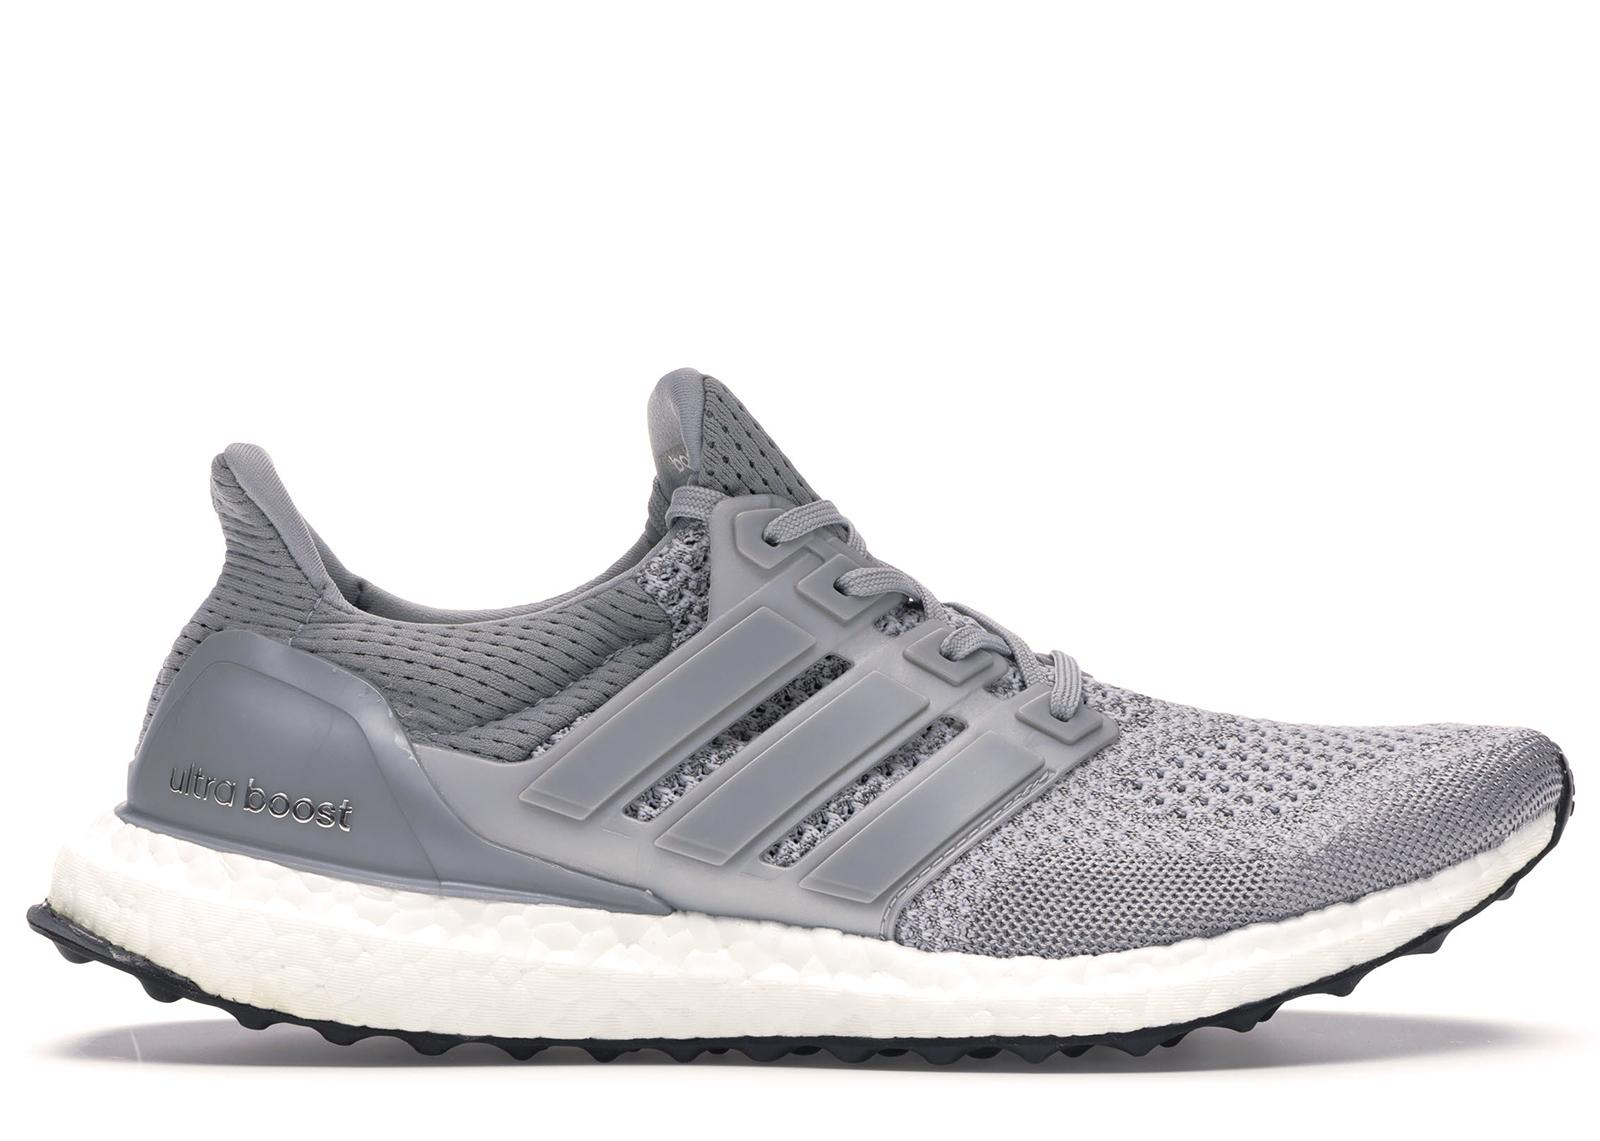 adidas Ultra Boost 1.0 Silver Metallic Grey